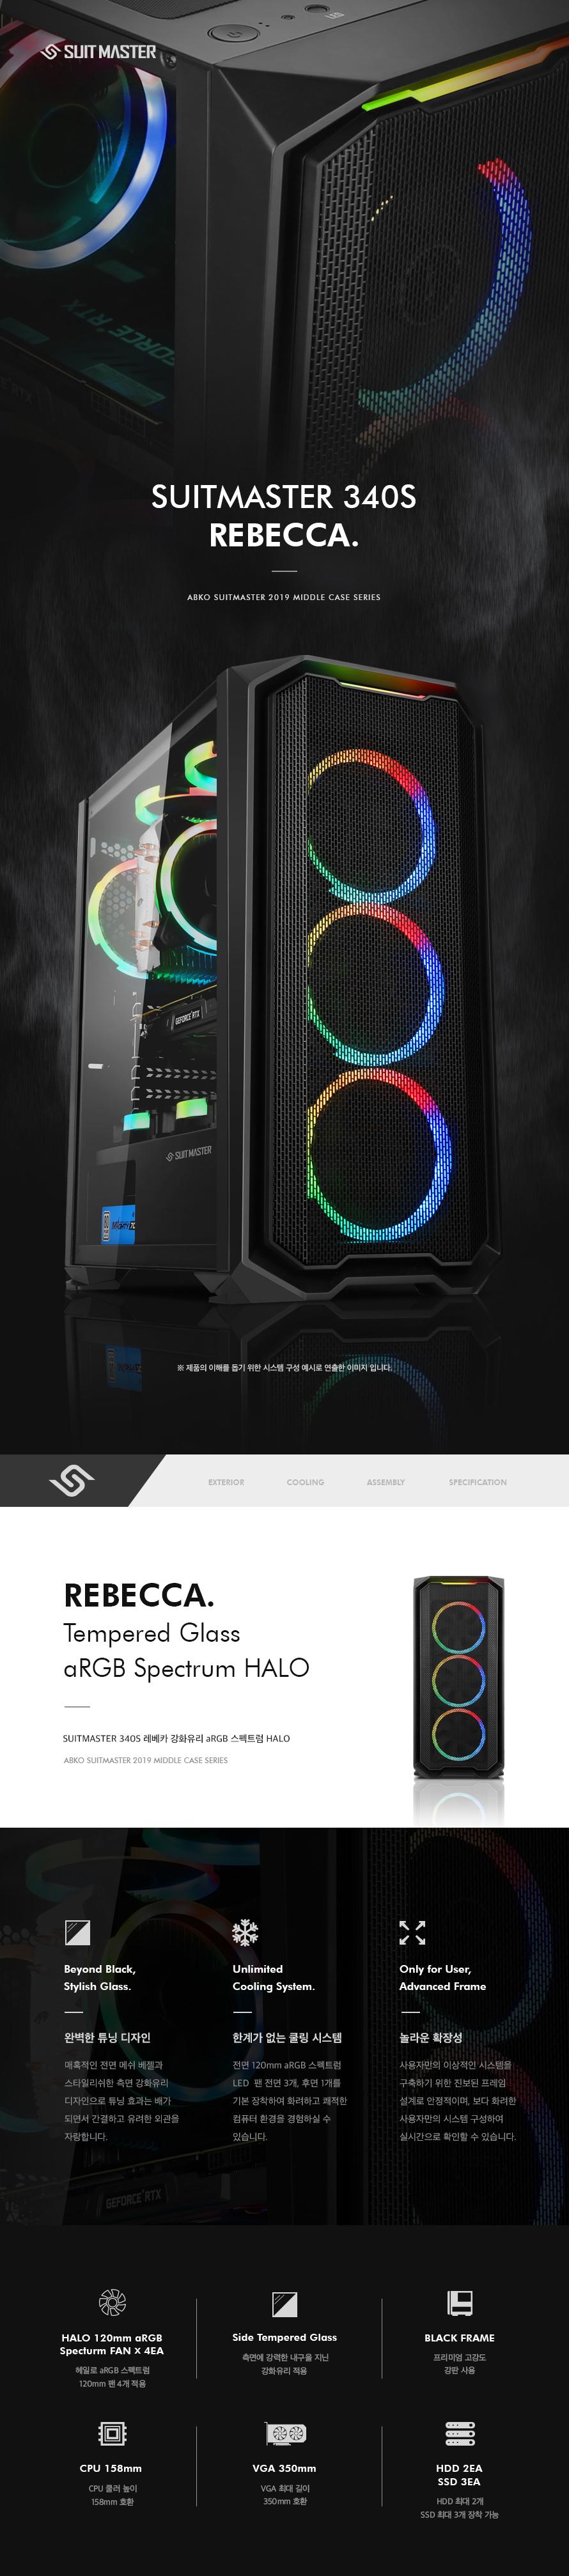 ABKO SUITMASTER 340S 레베카 강화유리 스펙트럼 RGB HALO